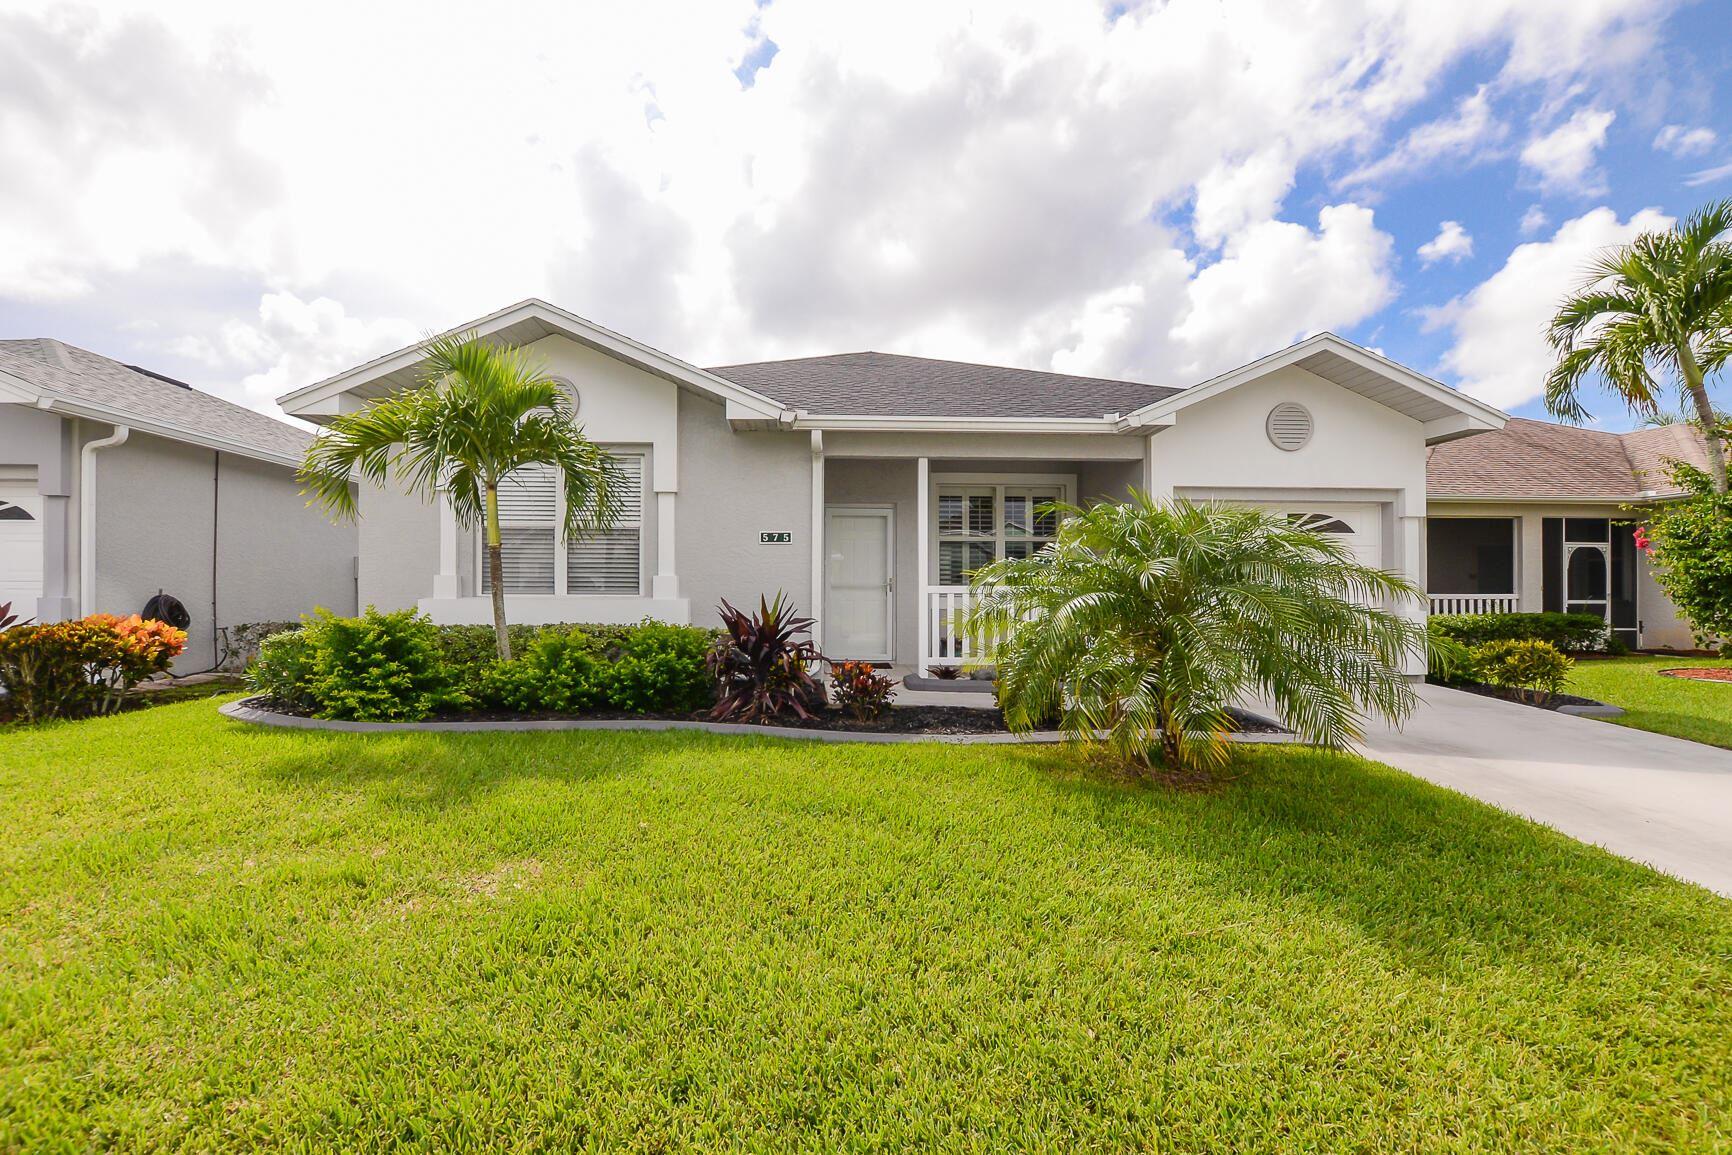 575 NW Cortina Lane, Port Saint Lucie, FL 34986 - MLS#: RX-10745372